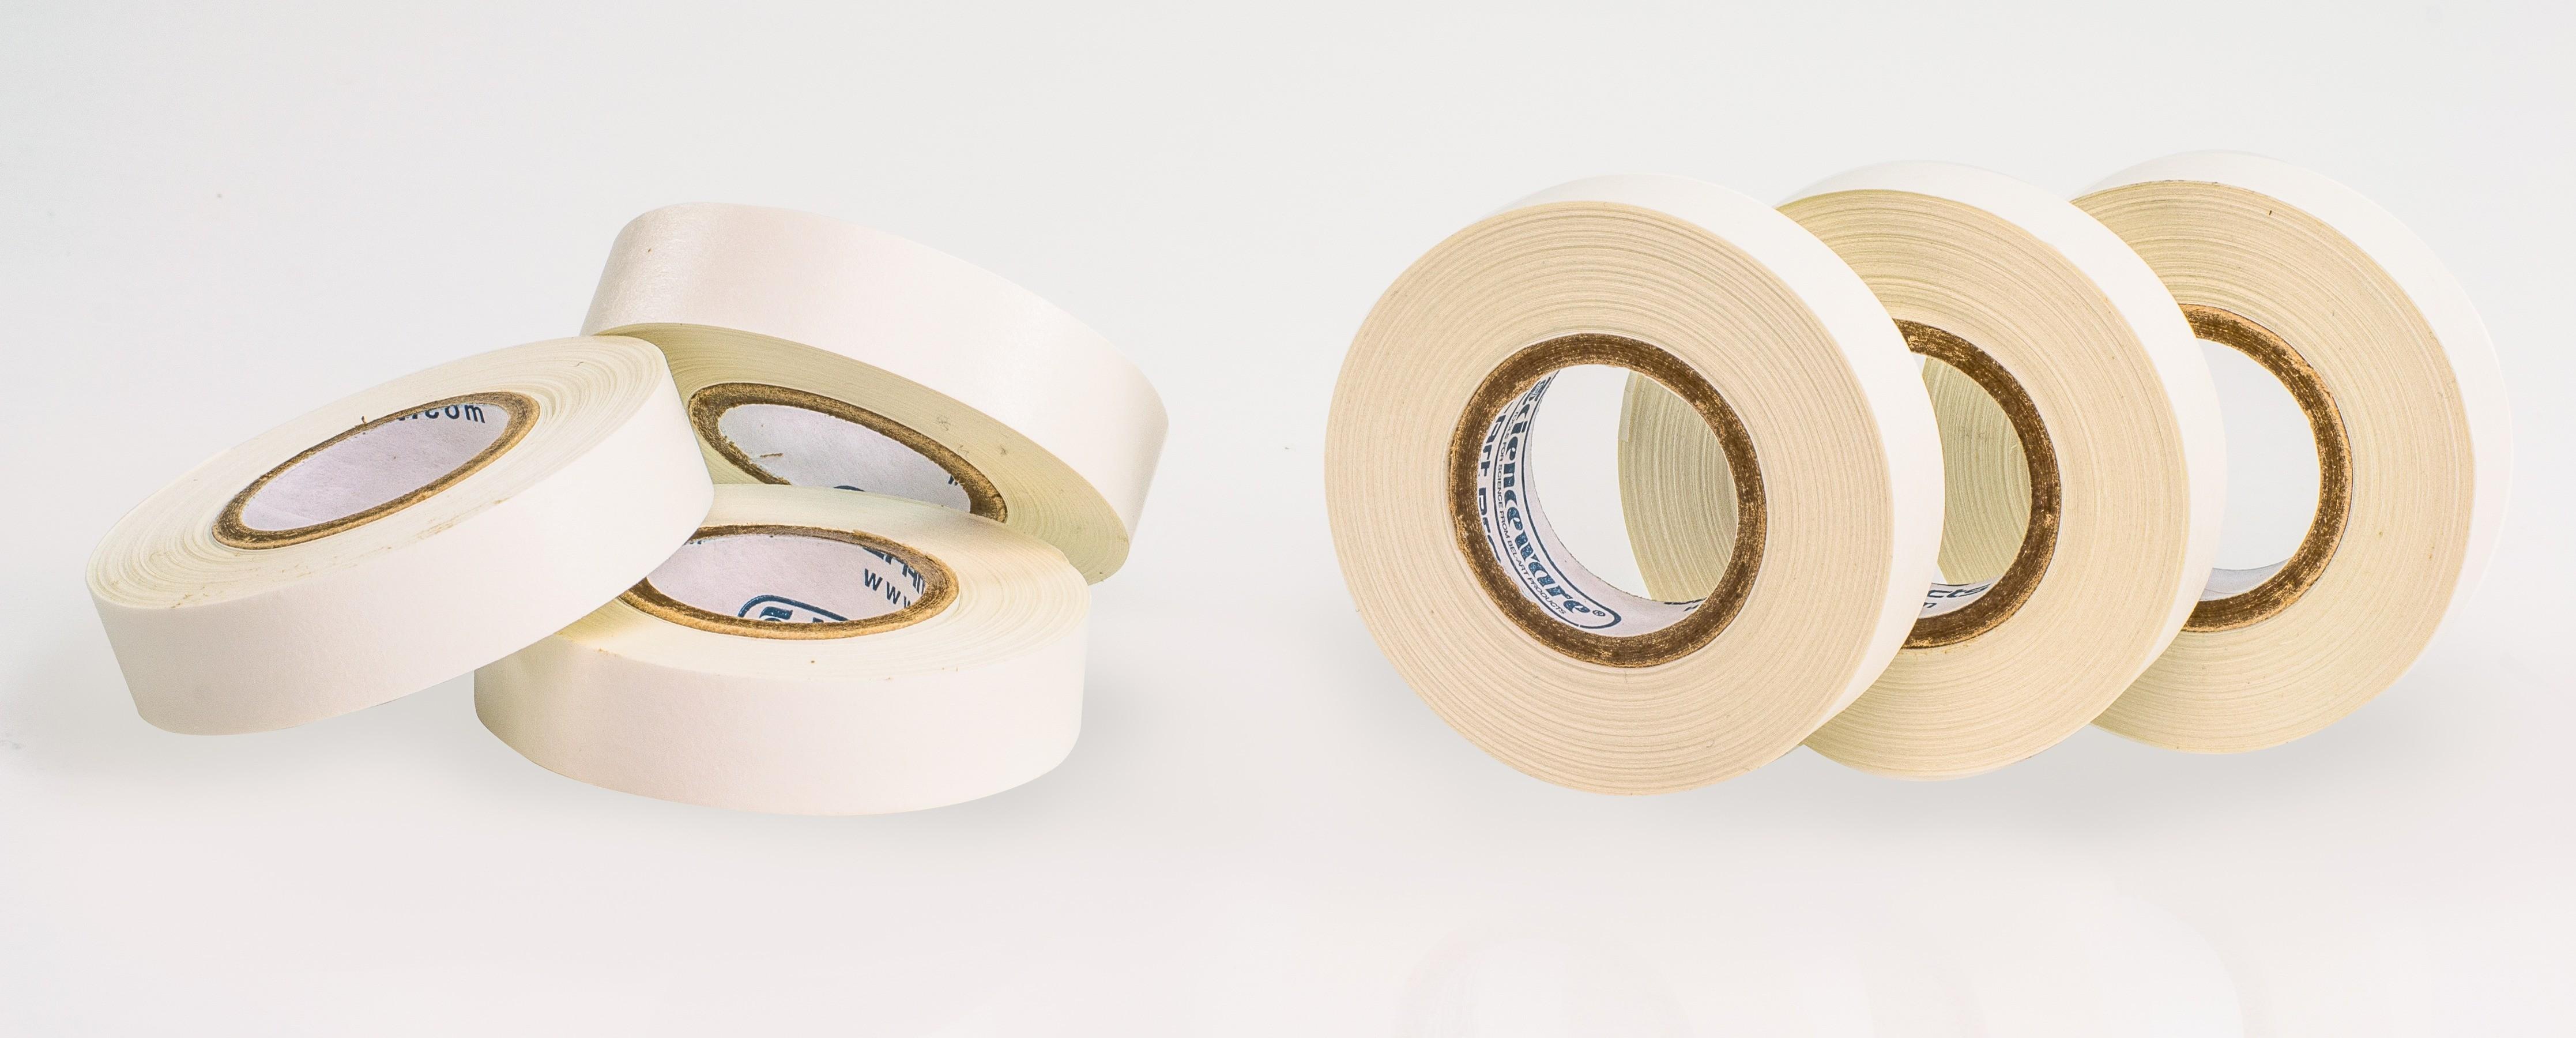 SP Bel-Art Write-On White Label Tape; 15yd Length, ¹/₂ in. Width, 1 in. Core (Pack of 6)